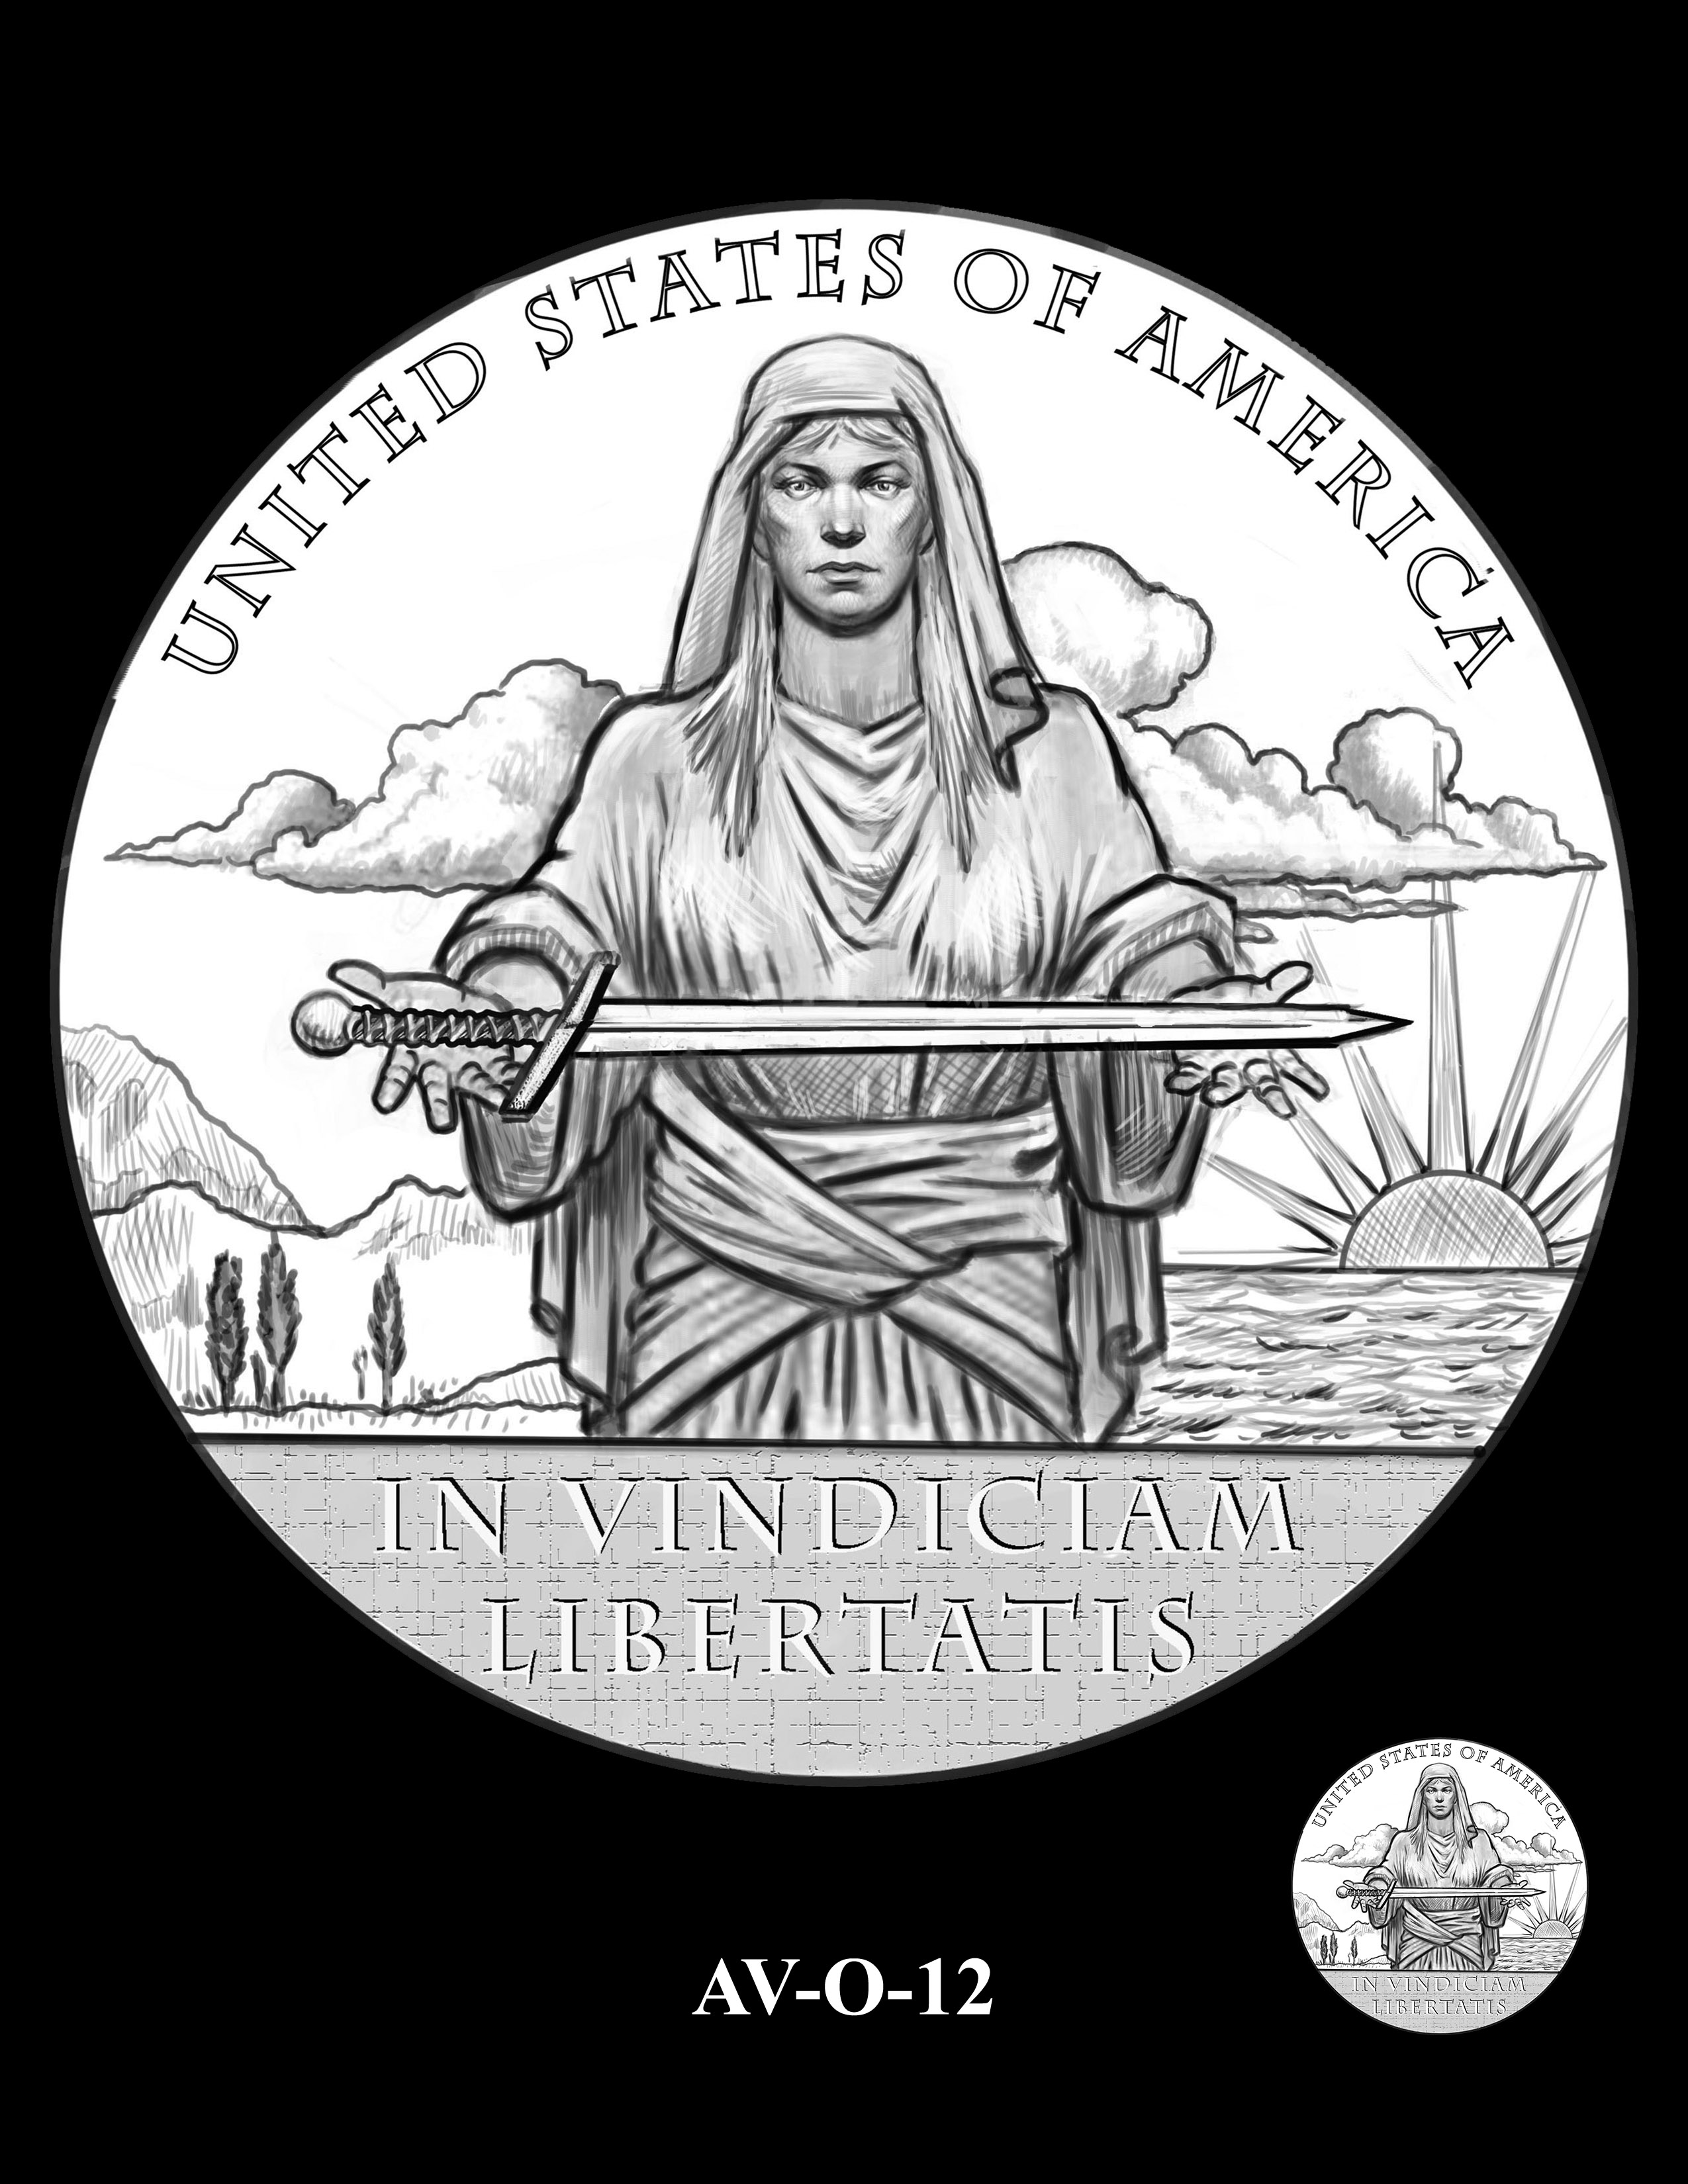 AV-O-12 - American Veterans Medal